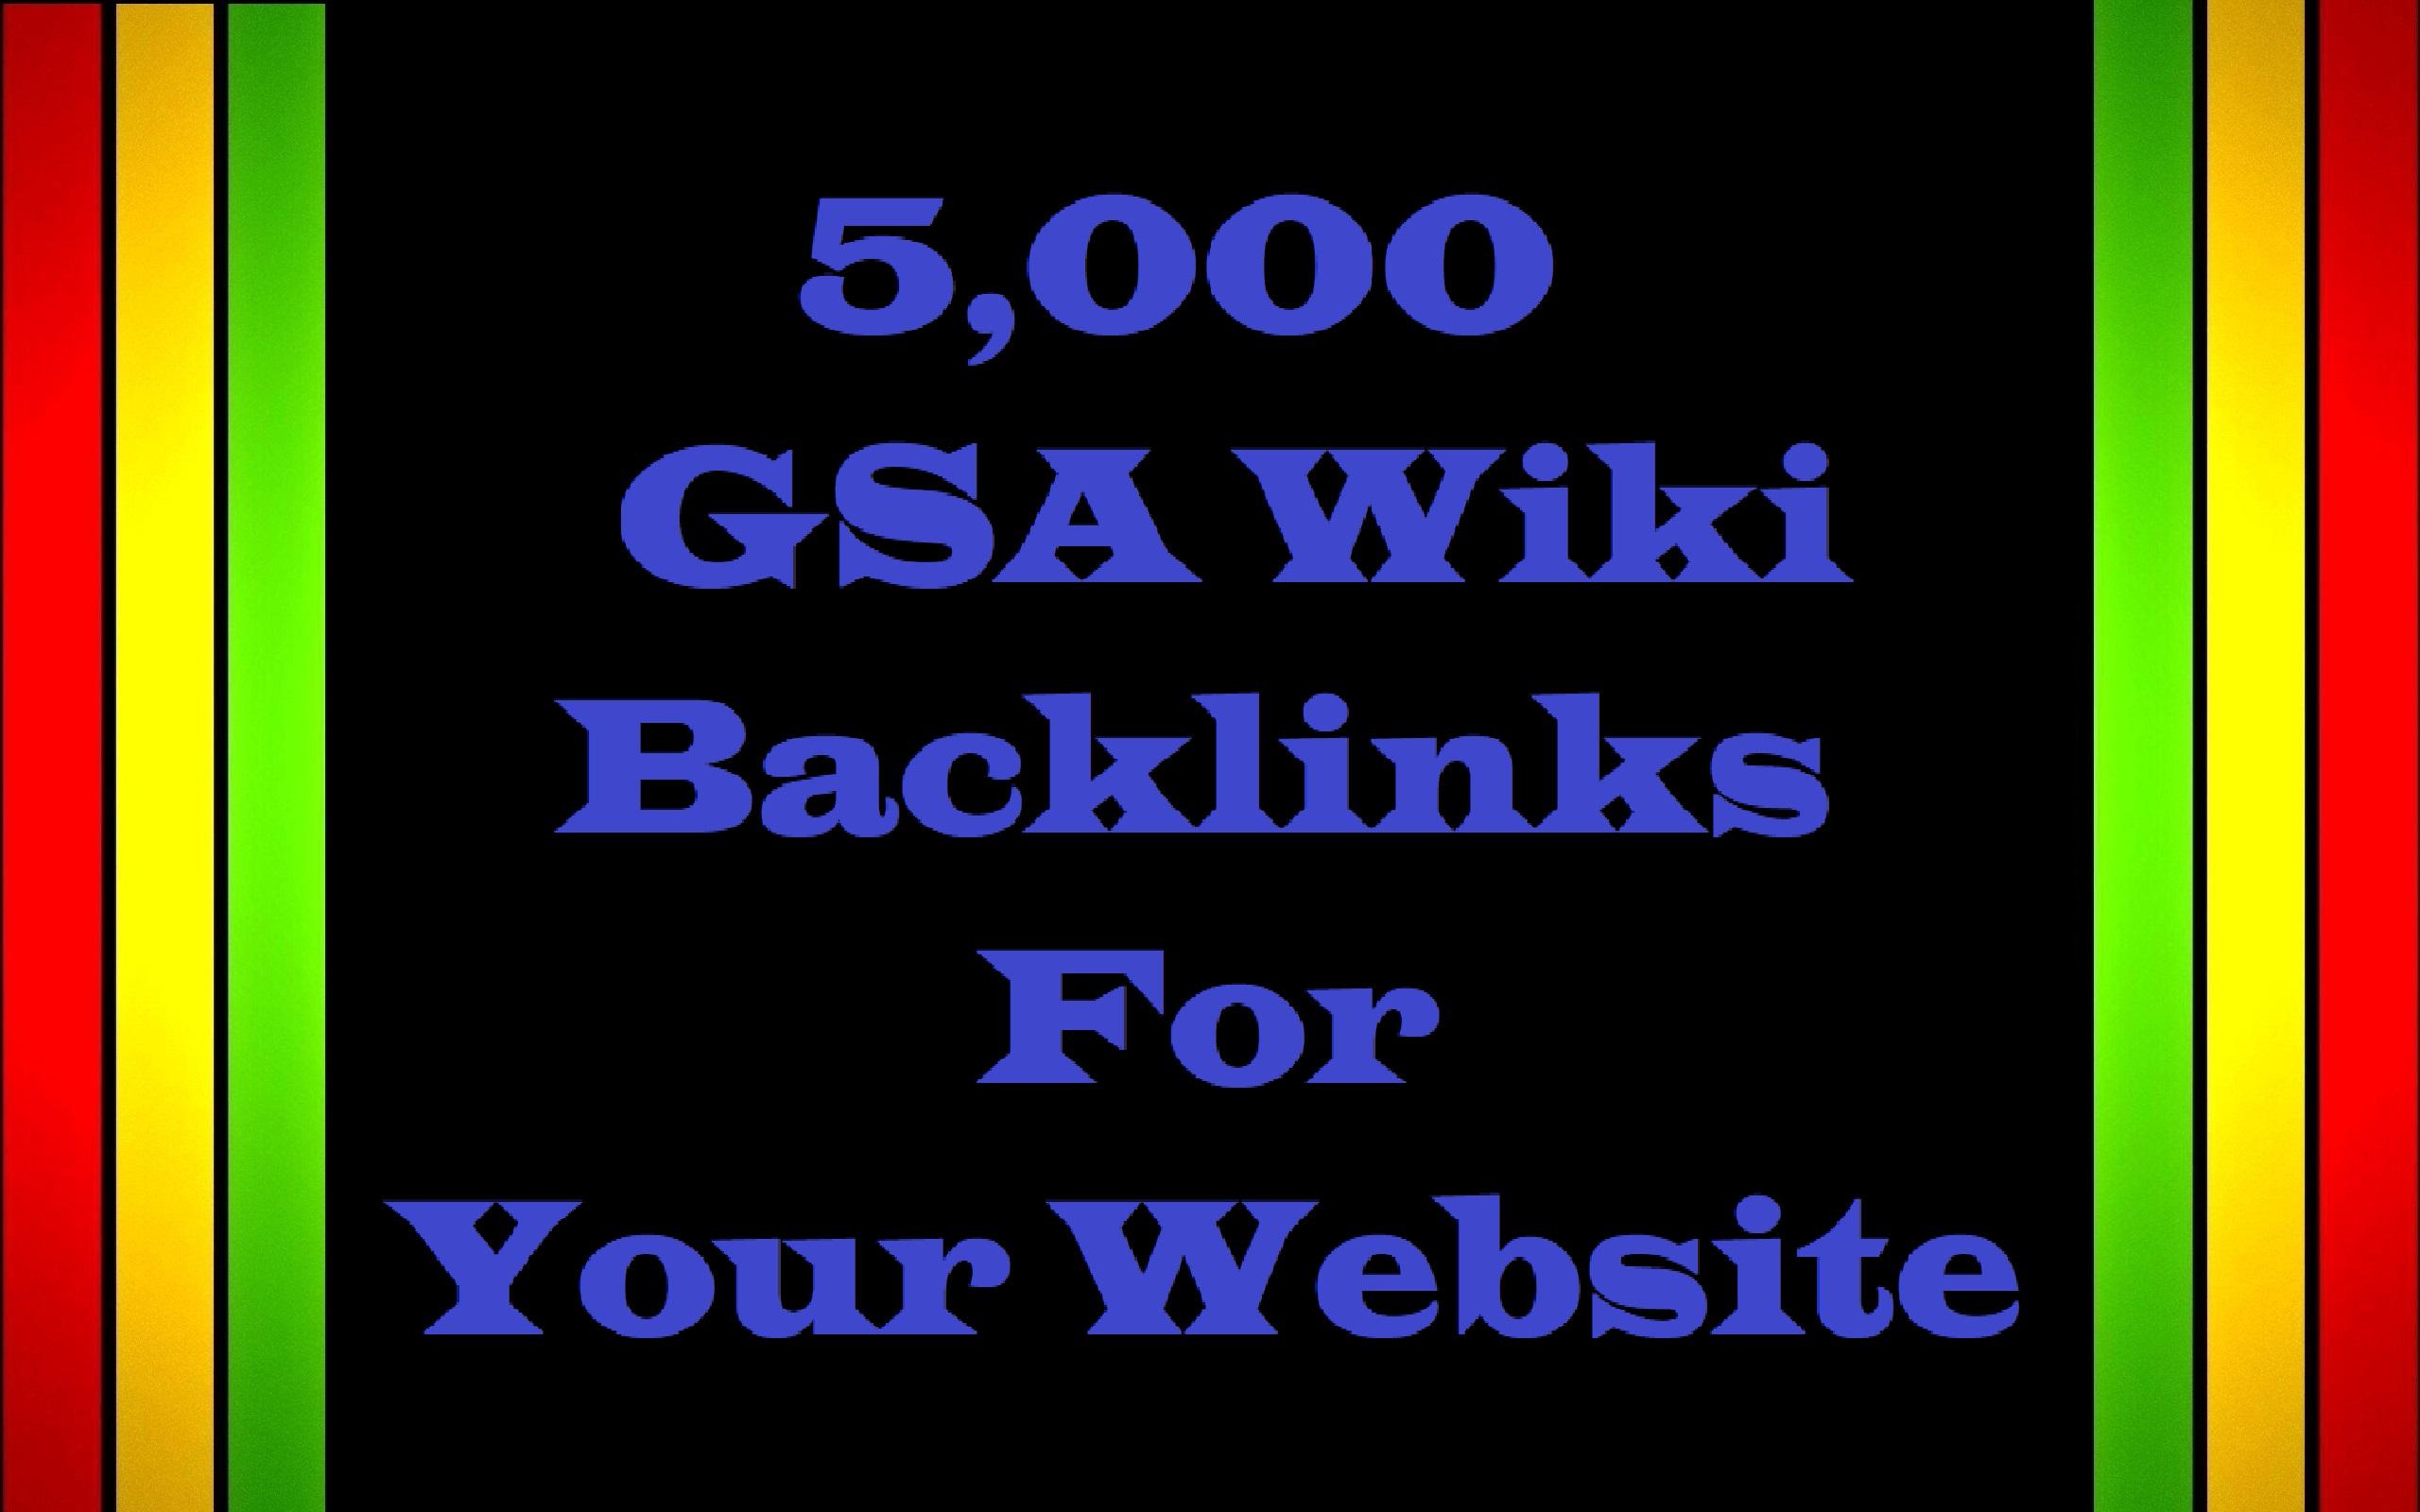 5,000 GSA wiki Backlinks For Your Website